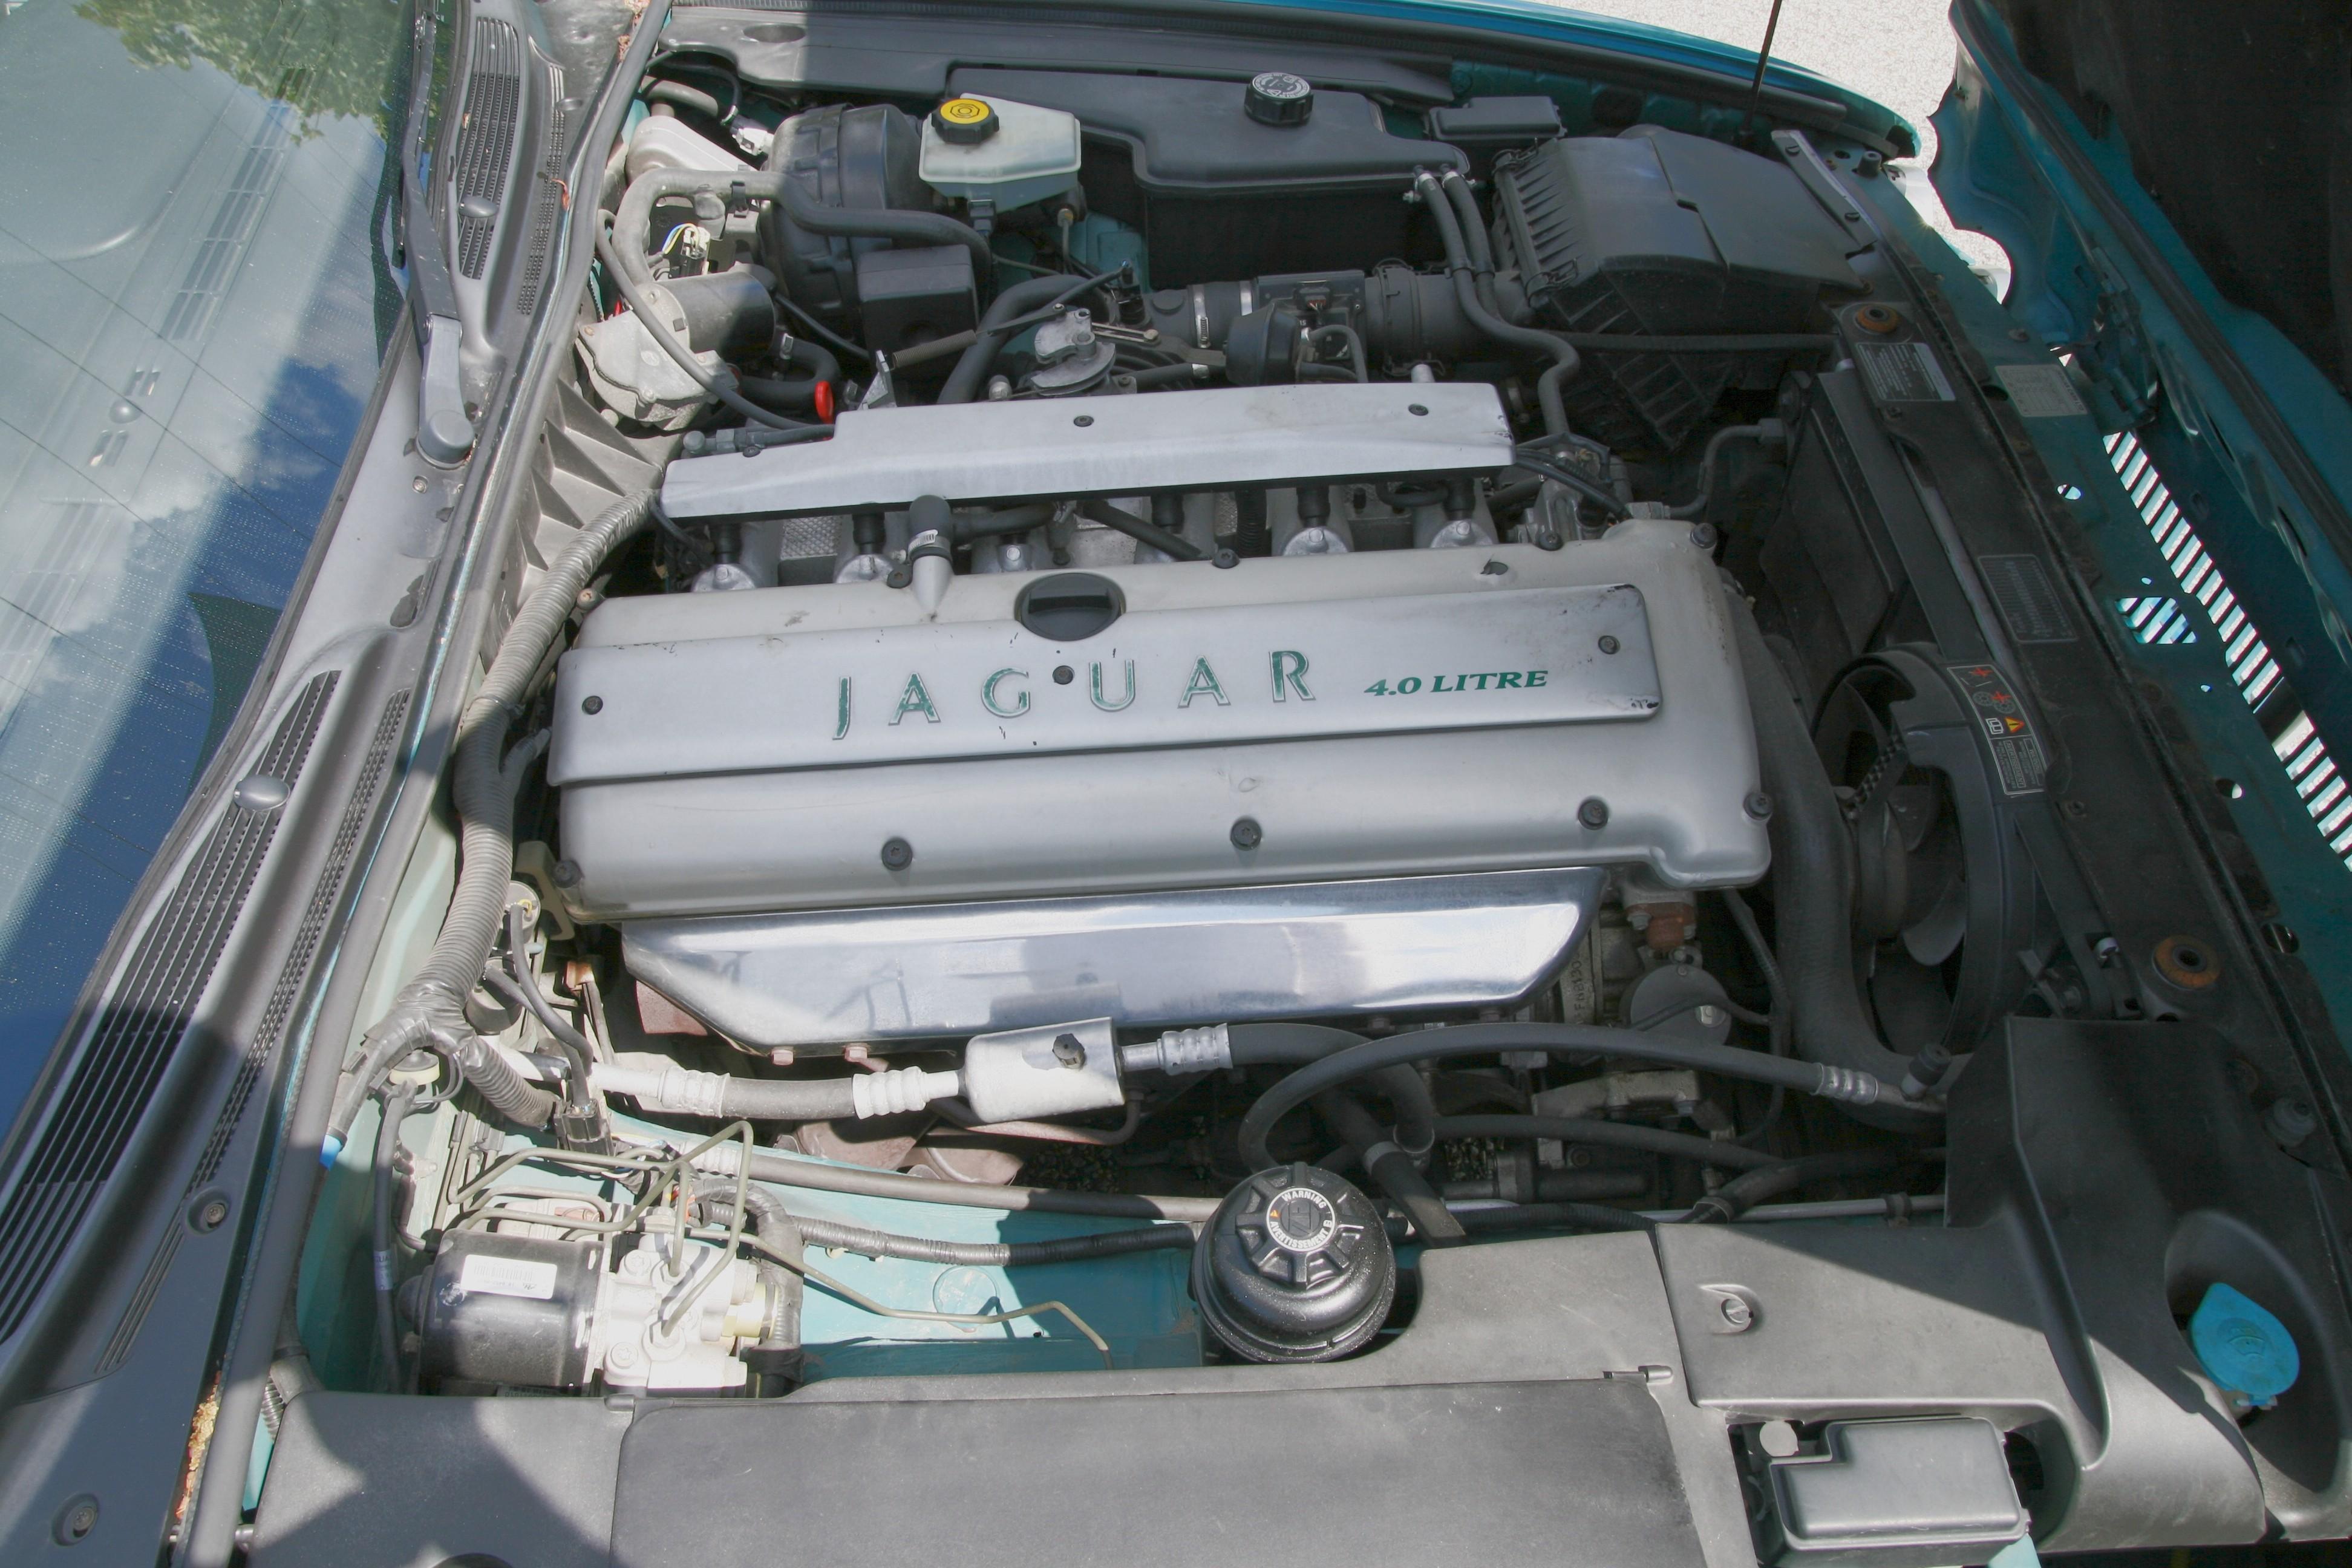 aj16 on feedyeti com rh feedyeti com Jaguar 4.0 V8 Engine Diagrams 2003 Jaguar X-Type Engine Diagram